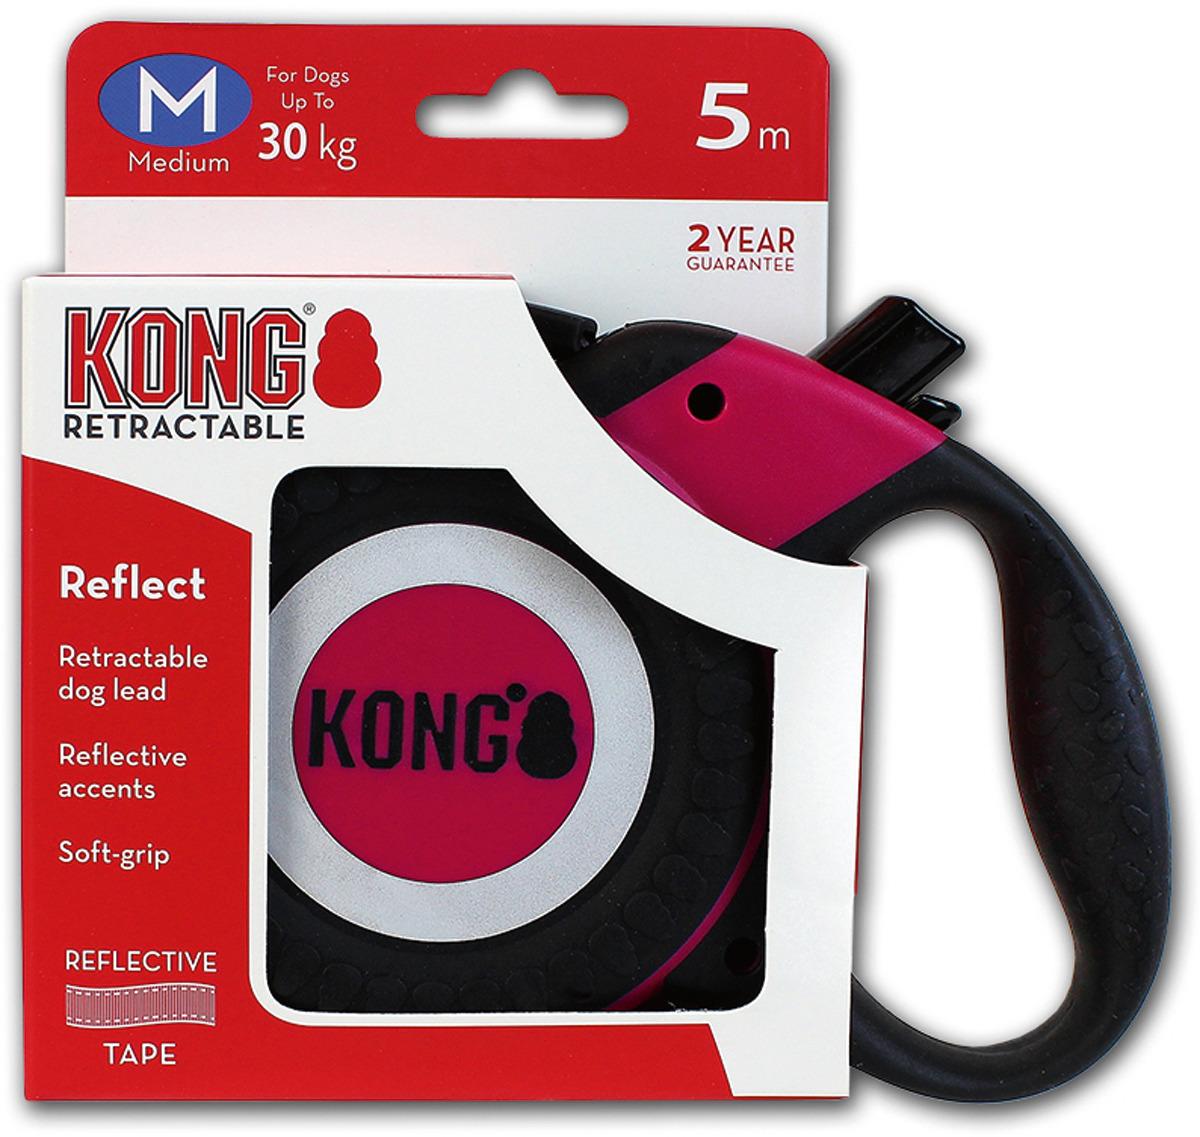 Поводок-рулетка для собак Kong Reflect M, цвет: фуксия, до 30 кг, 5 м